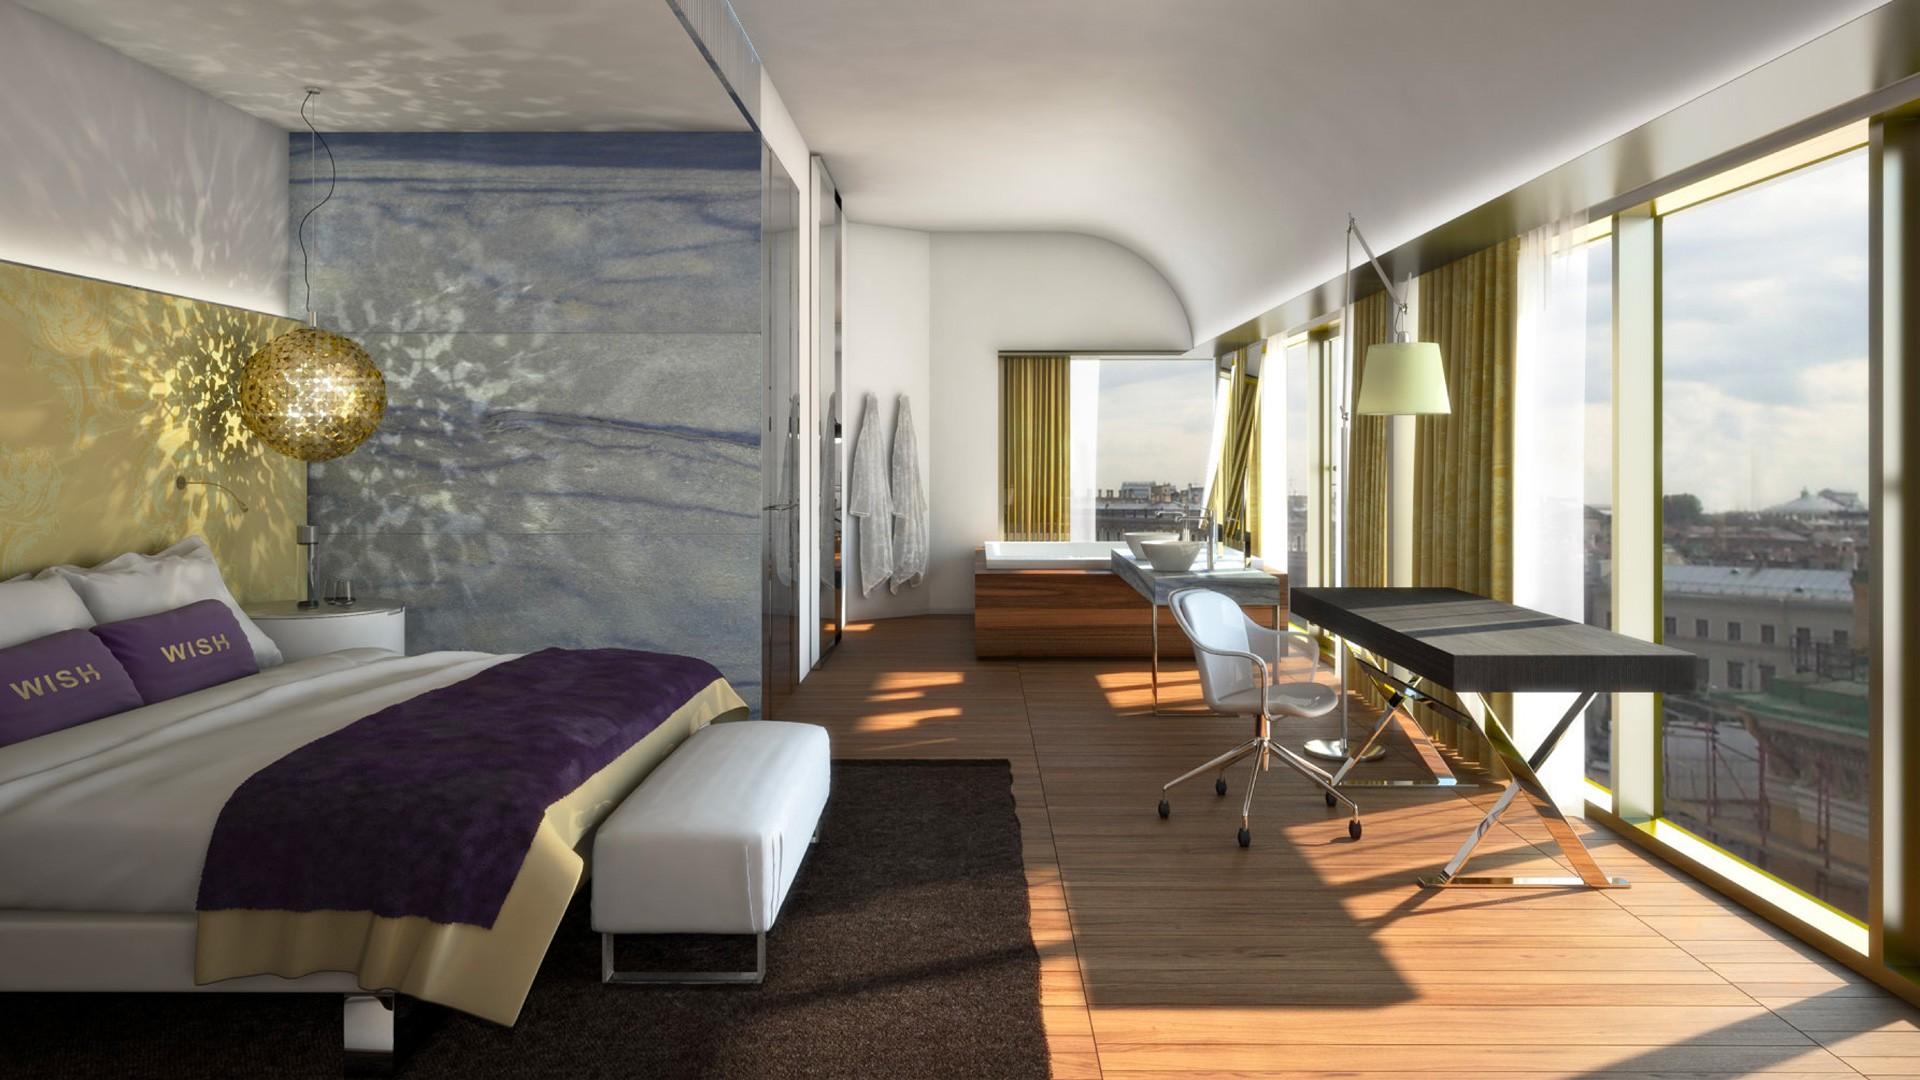 Poliform_contract_hospitality_HOTEL_W_04_1920x1080px_gallery 1